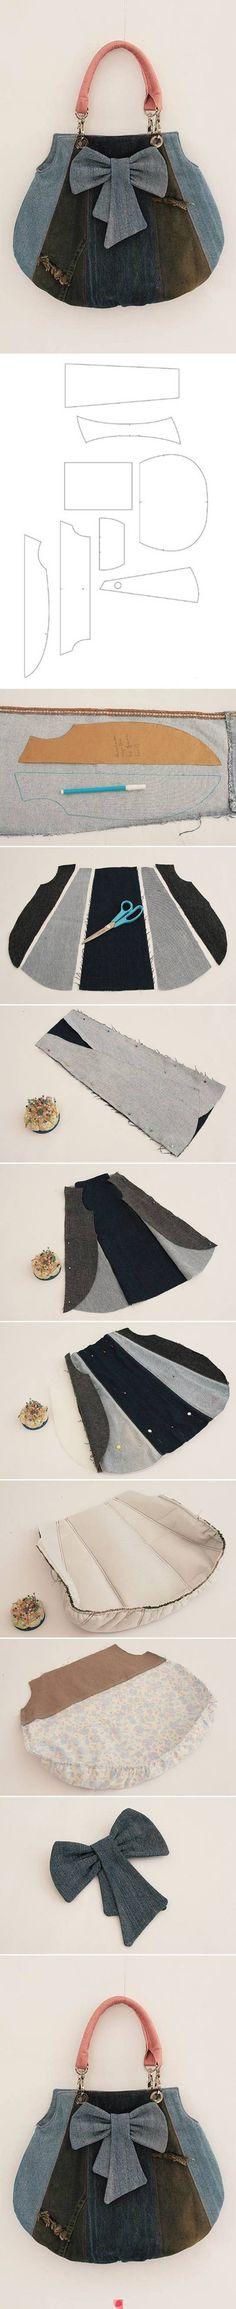 Good tutorial on making a Denim / Blue Jean Purse / Hobo Bag cute